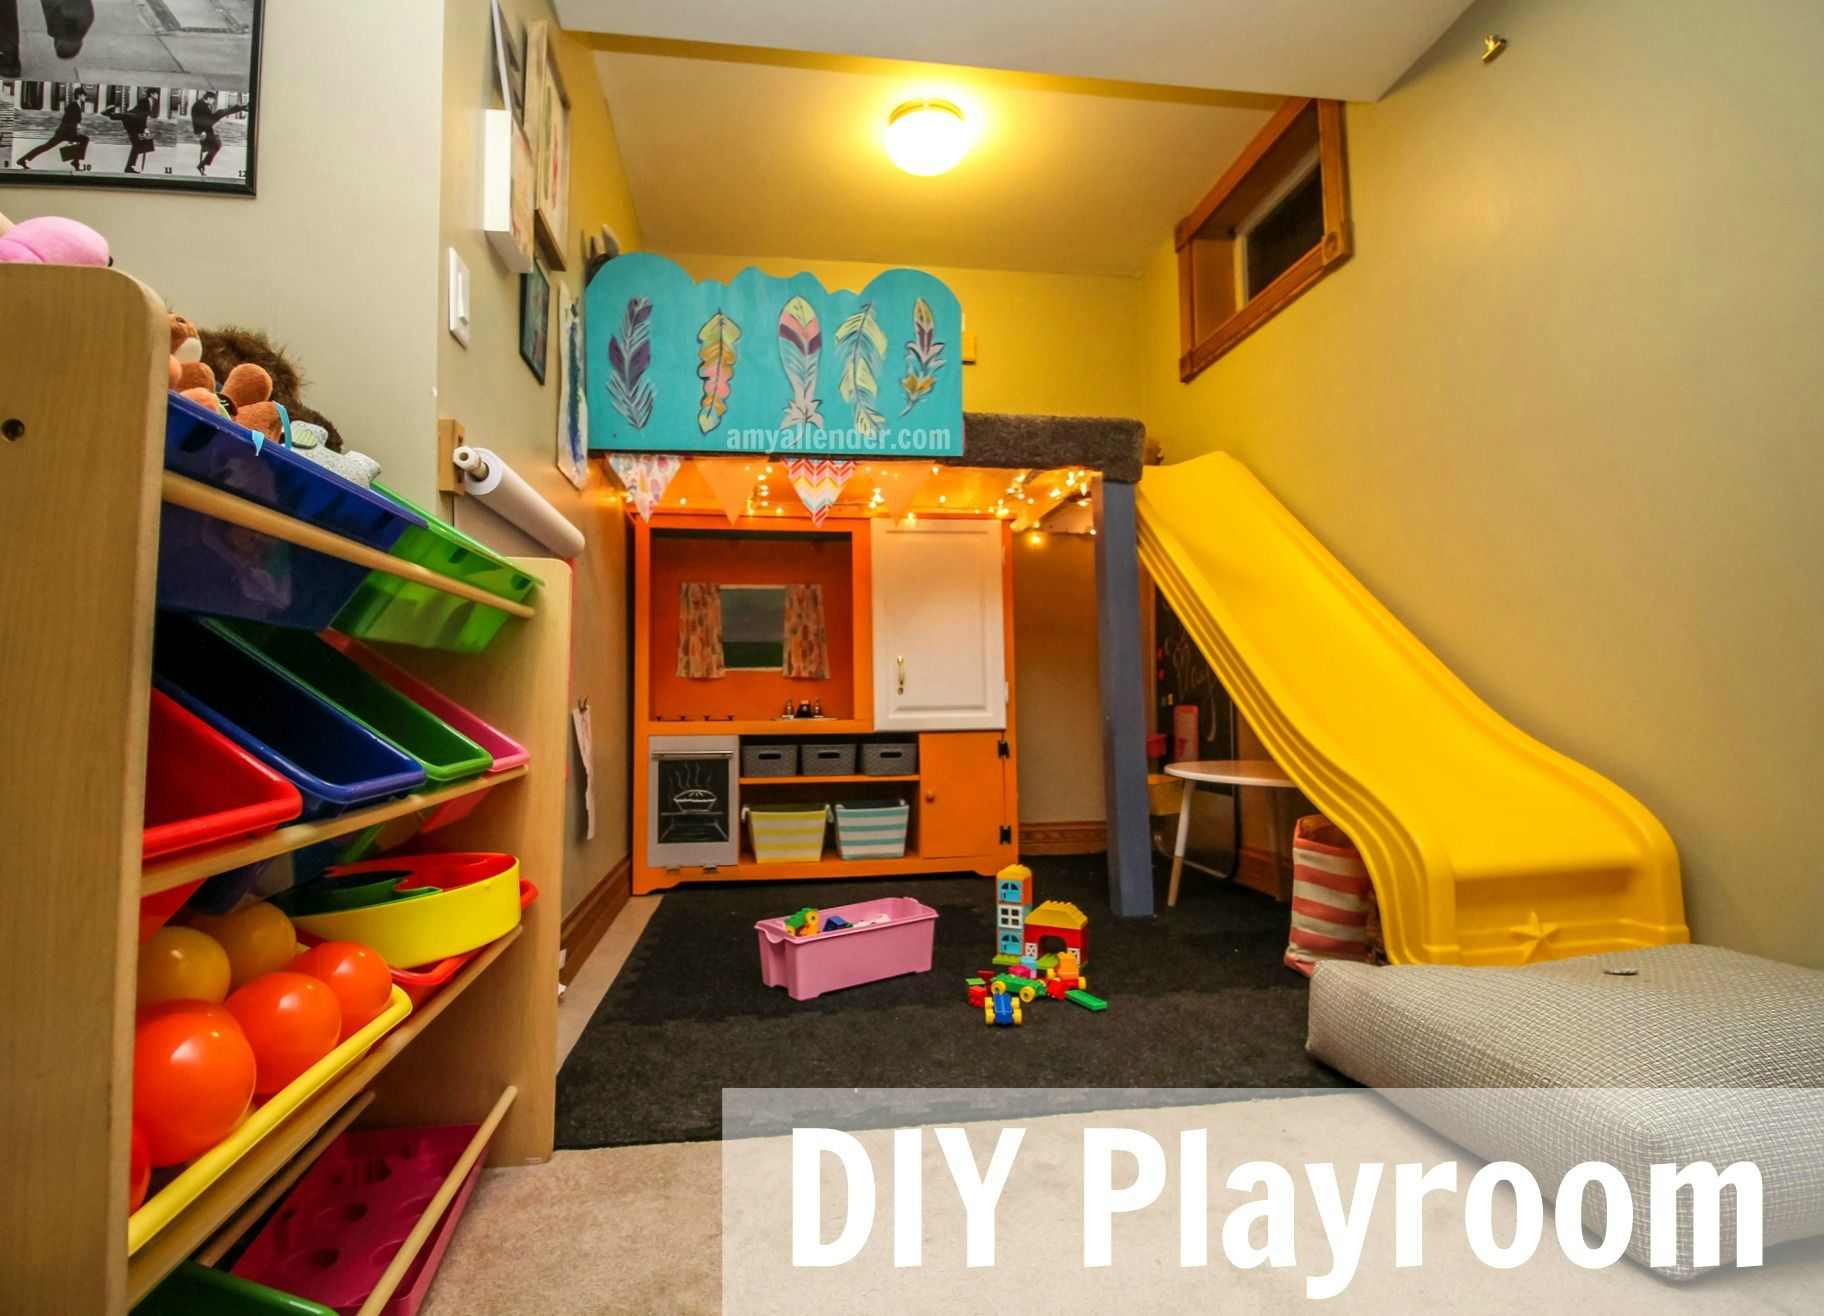 Diy Playroom Small Playroom Kids Playroom Ideas Diy Playroom